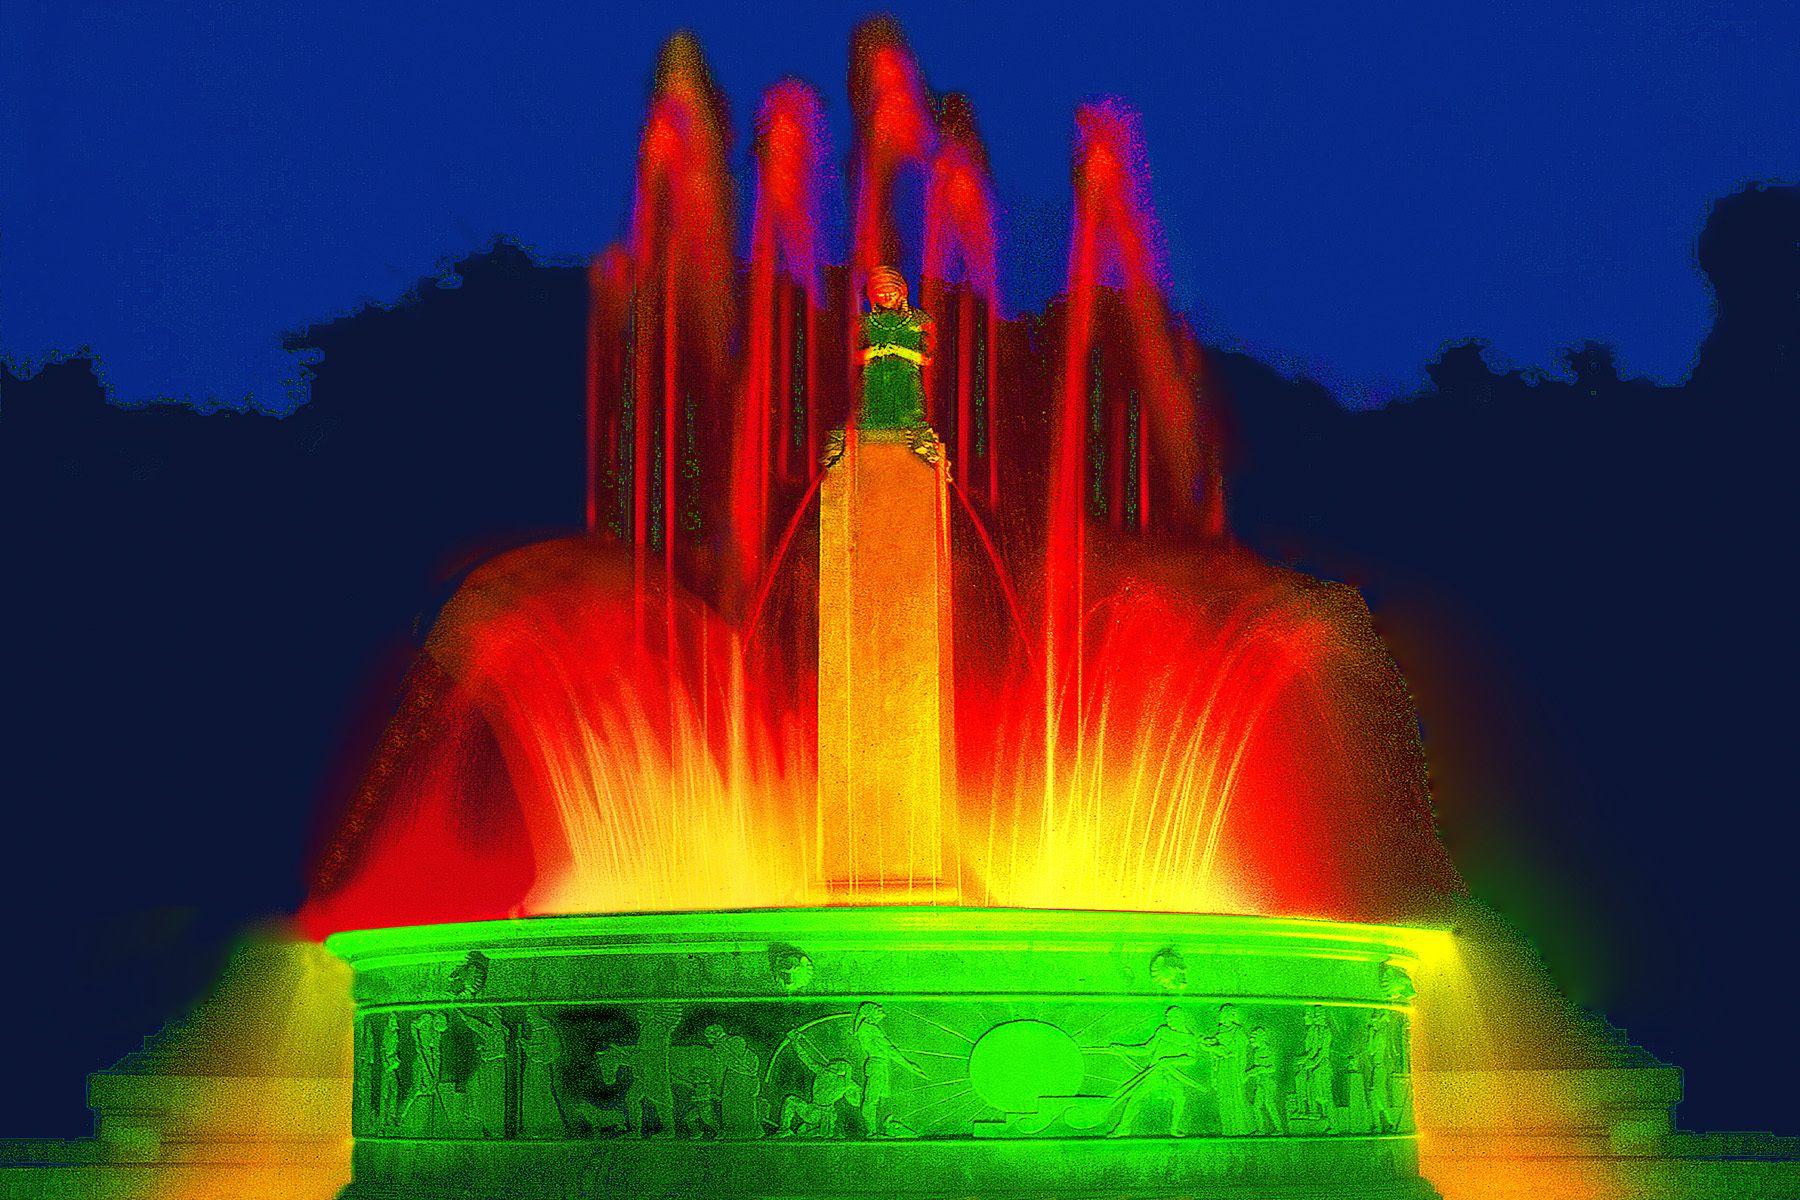 10_0_27_1c_jane_gottlieb___la_deco_fountain.jpg